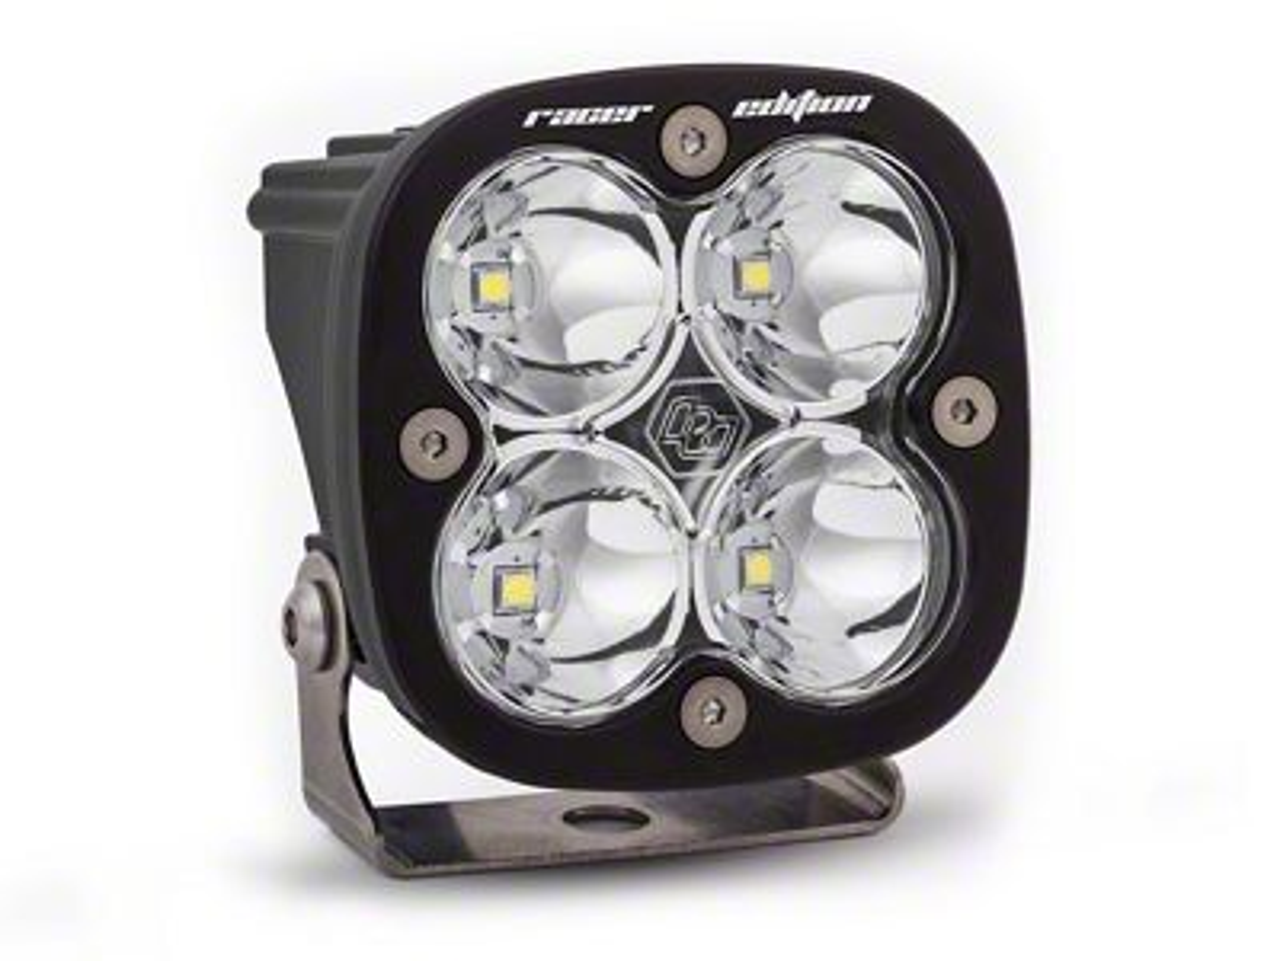 Baja Designs Squadron Racer Edition LED Light - Spot Beam